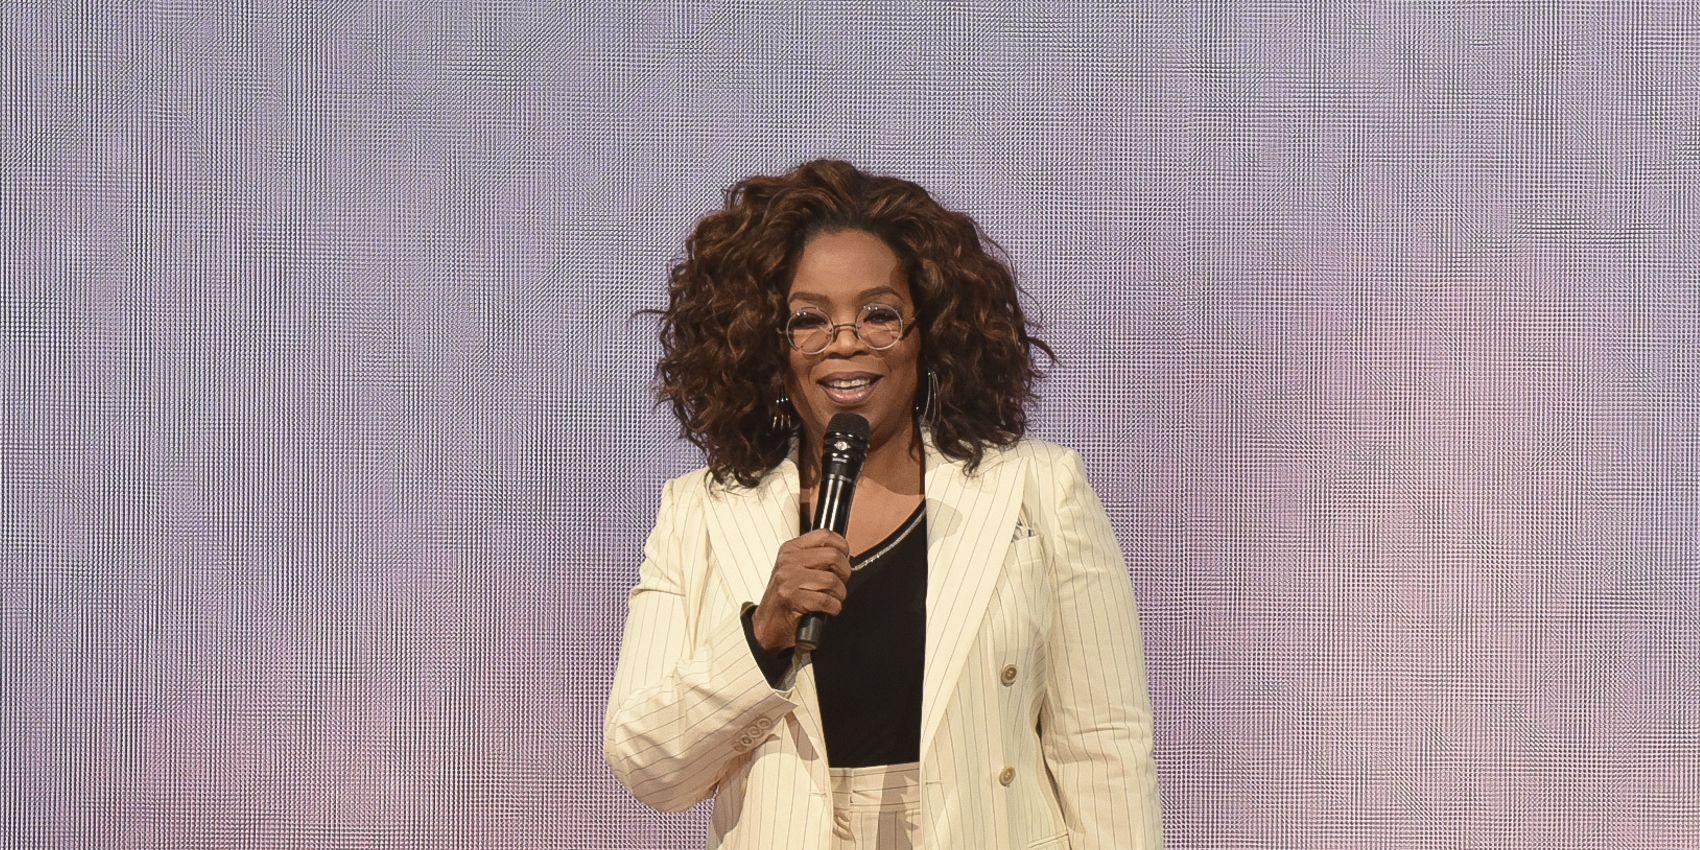 Facebook hosting virtual graduation with Oprah as commencement speaker